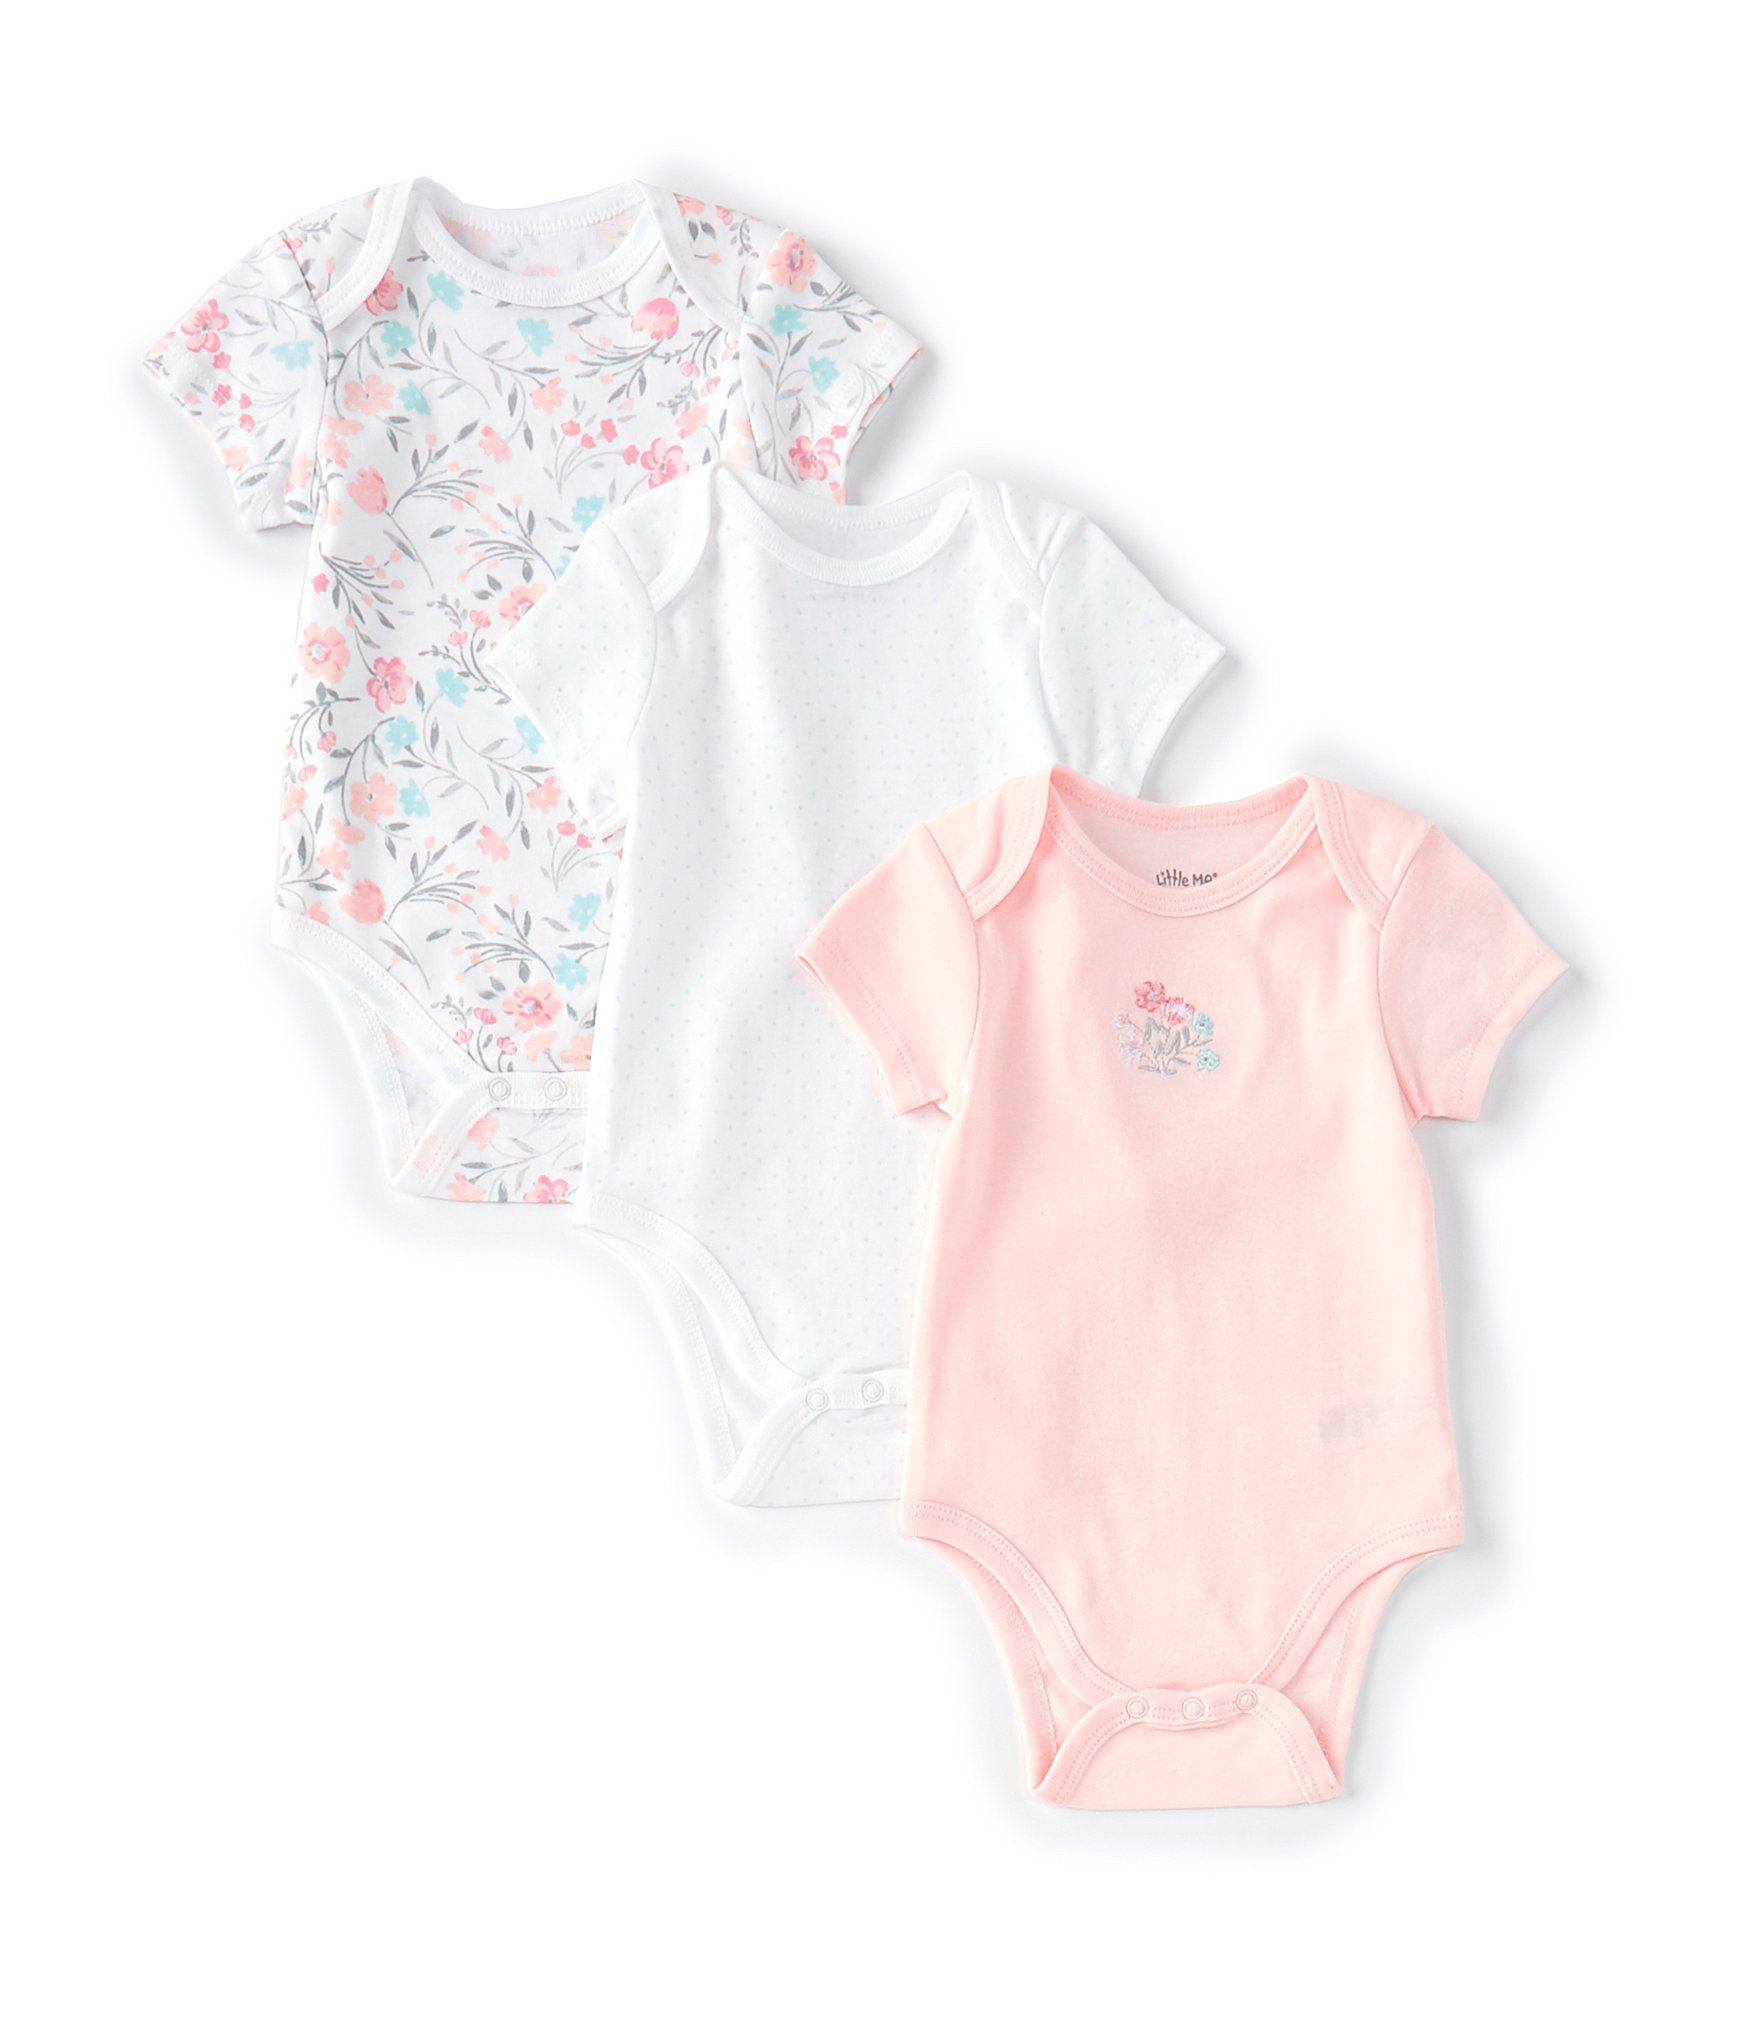 Newborn Baby Boys Bodysuit Short-Sleeve Onesie Cute Giraffe Print Outfit Summer Pajamas